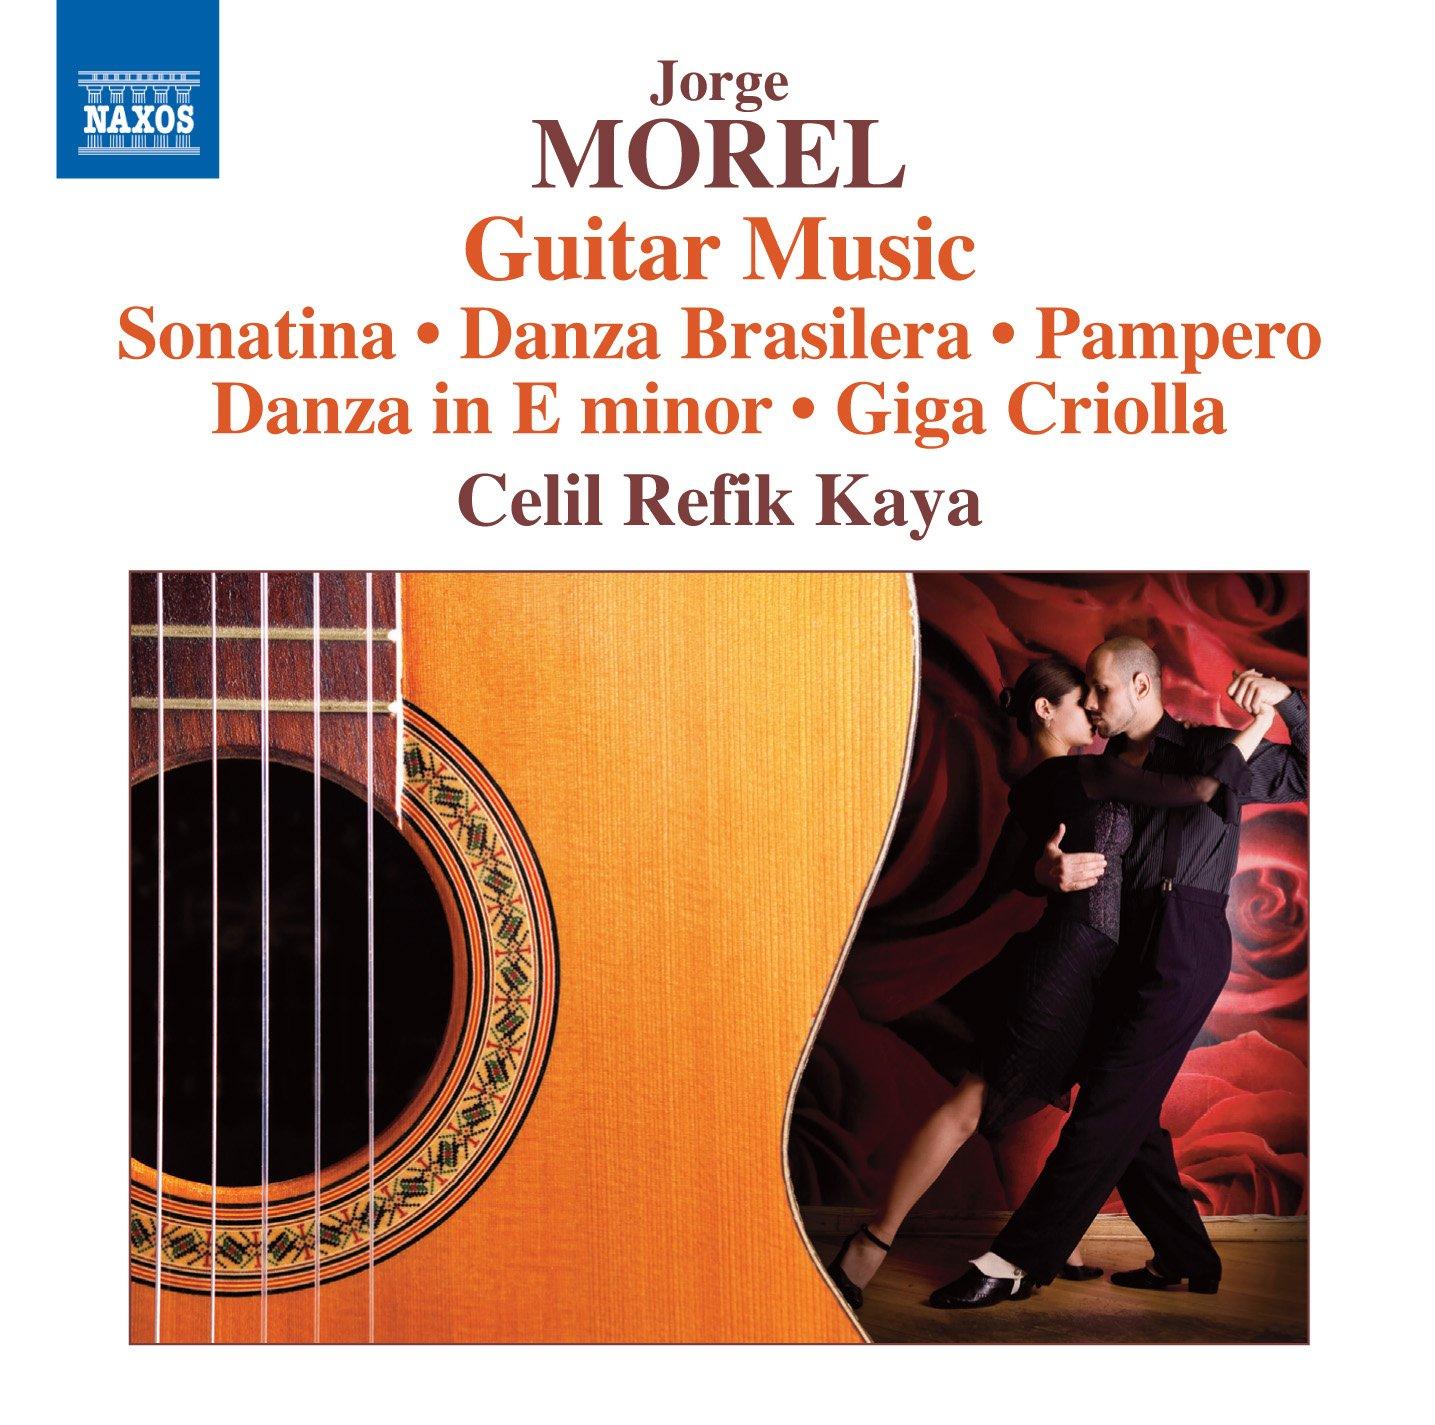 MOREL, J.: Guitar Music - Sonatina / Danza Brasilera / Pampero ...